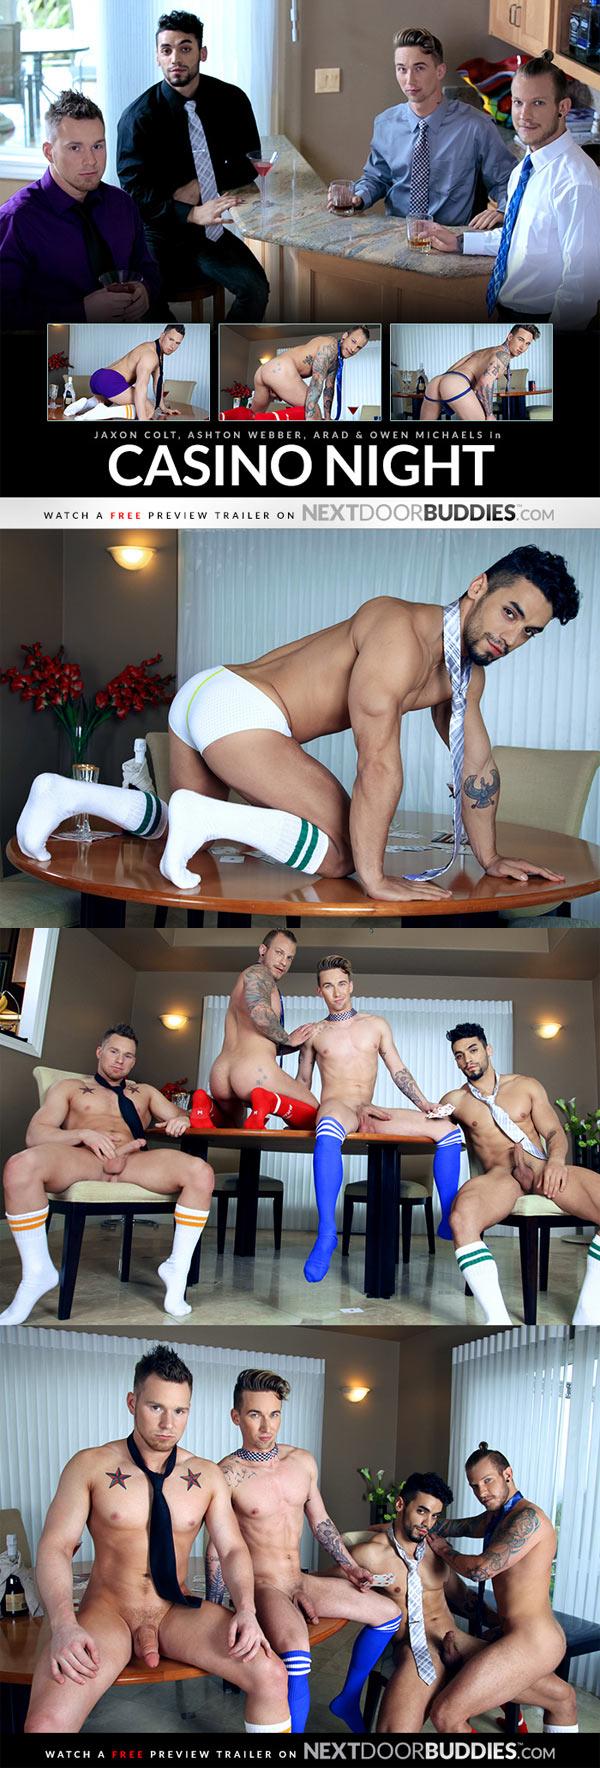 Casino Night (Jaxon Colt, Ashton Webber, Arad & Owen Michaels) at Next Door Buddies